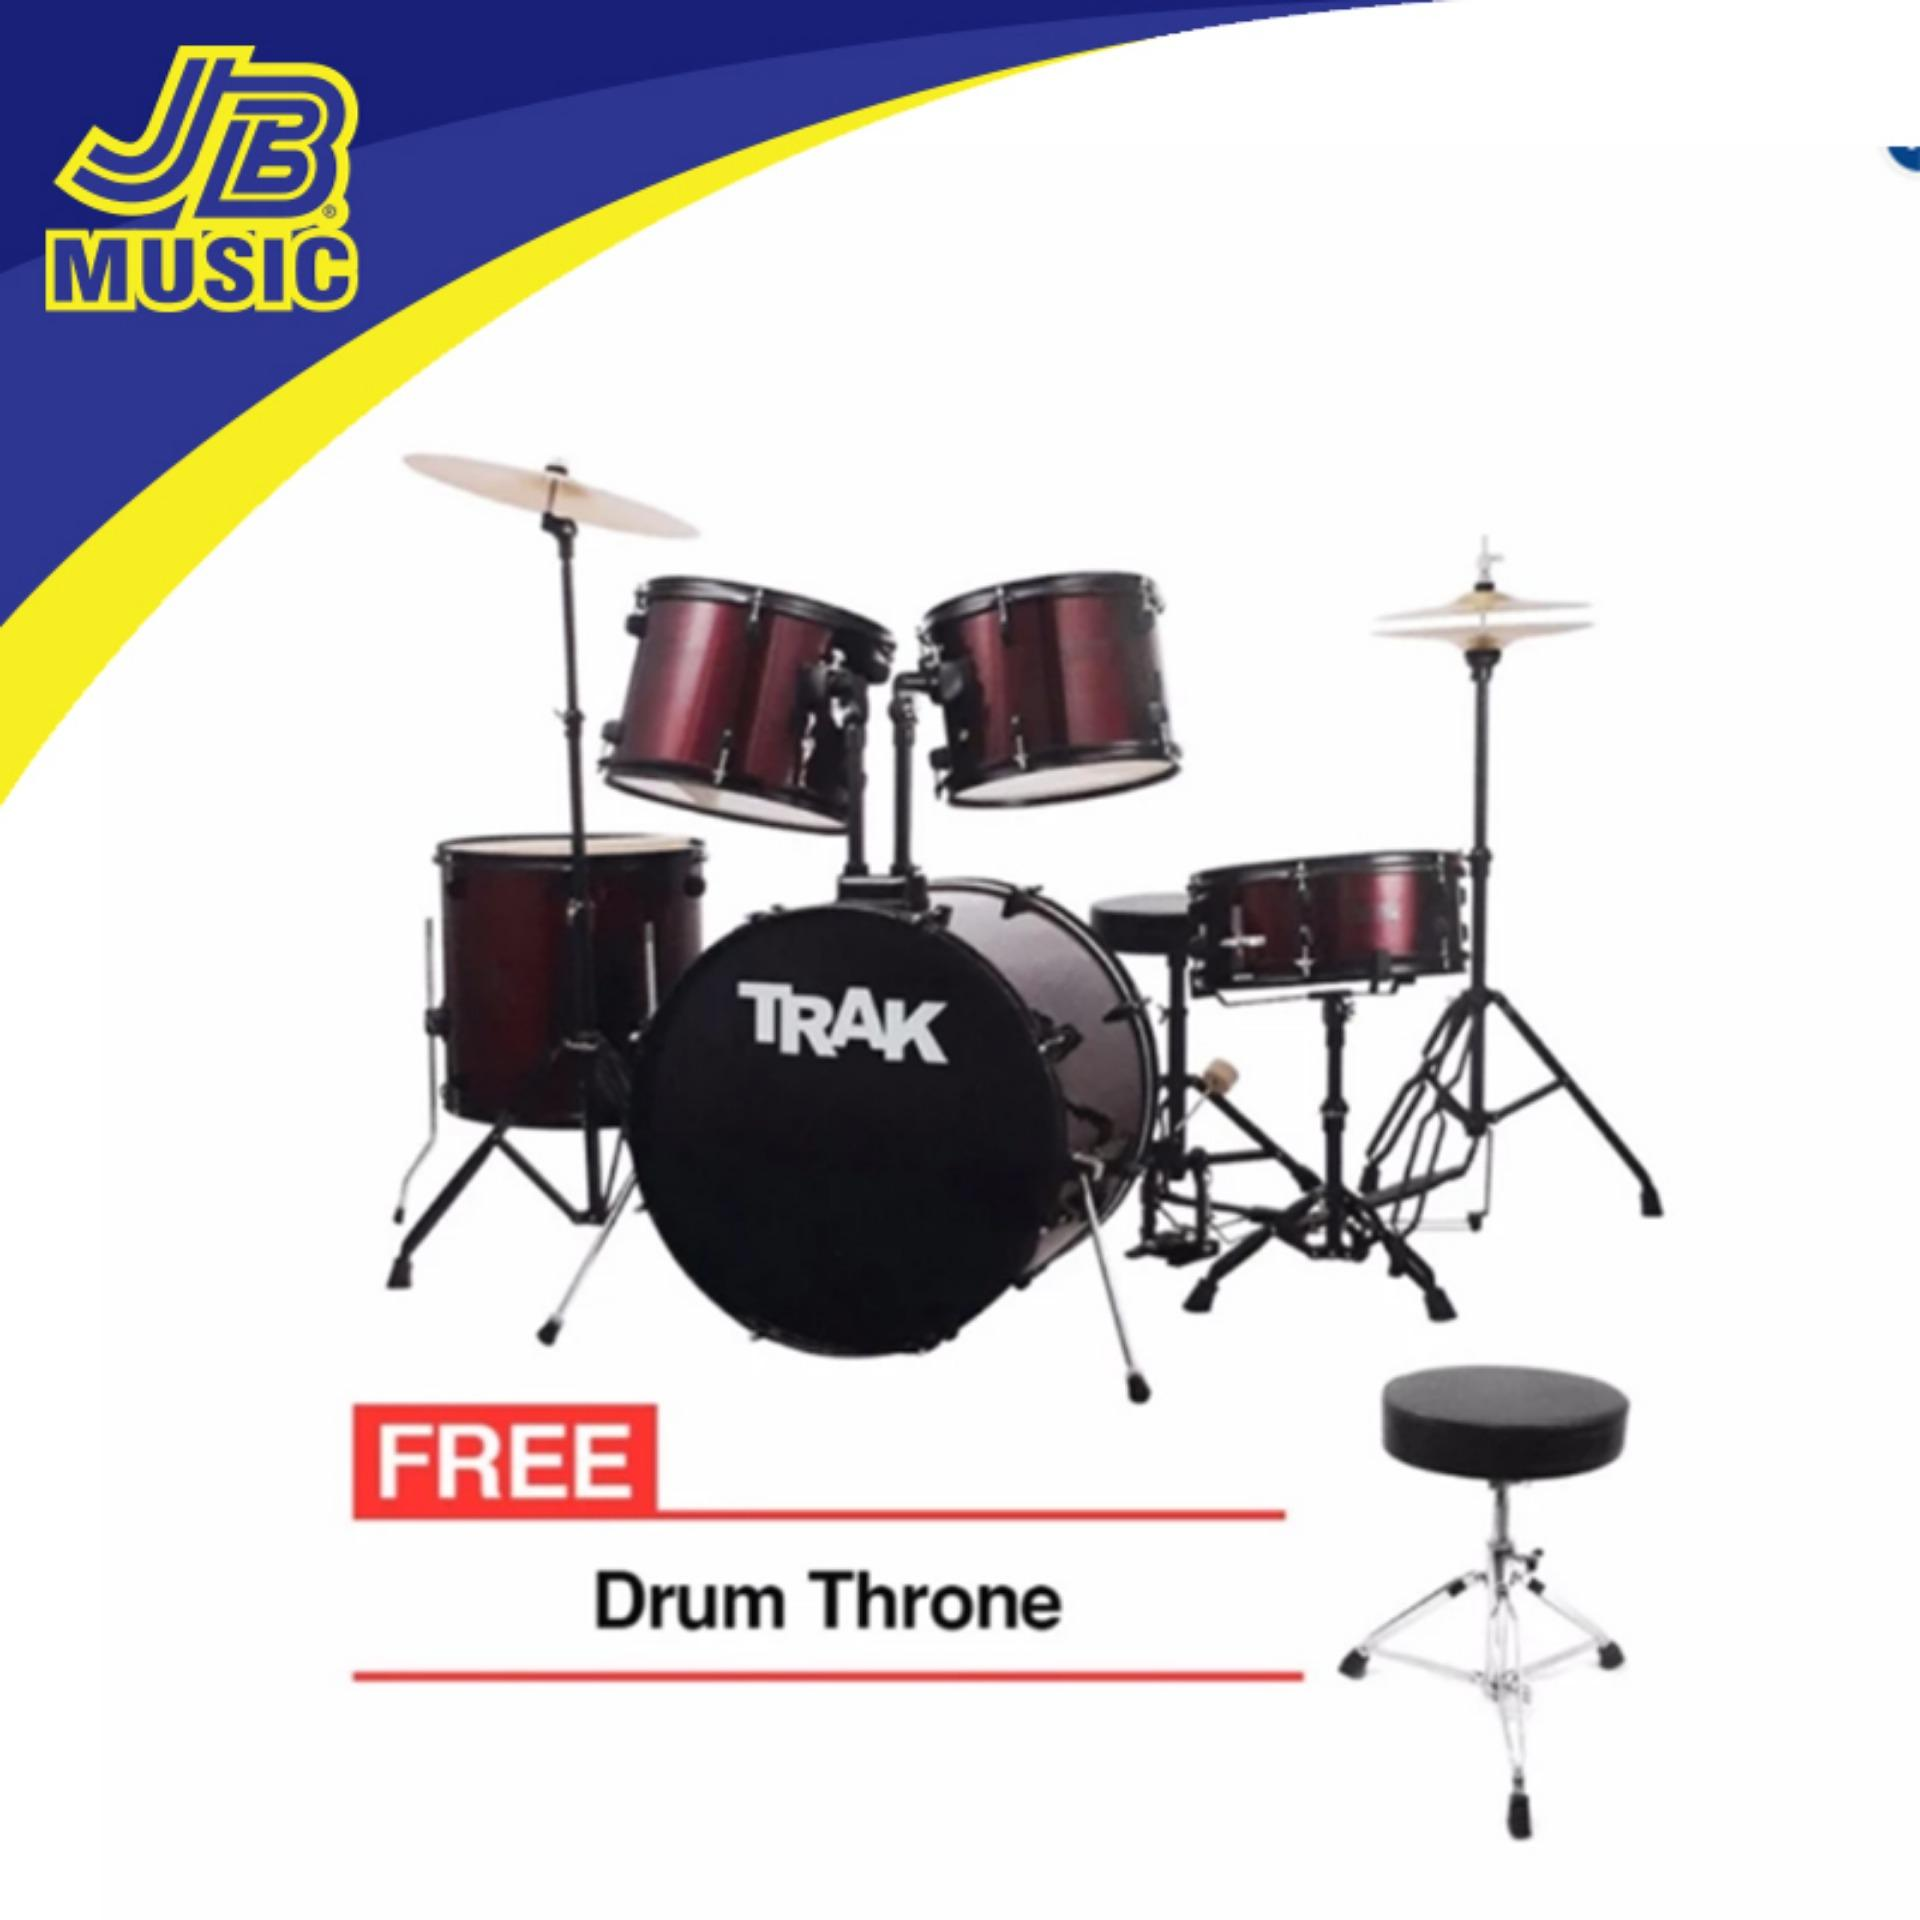 Drum Sets For Sale Rock Band Drums Best Seller Prices Brands In 1 Set Trak Jbp1601a 5pc Drumset Red